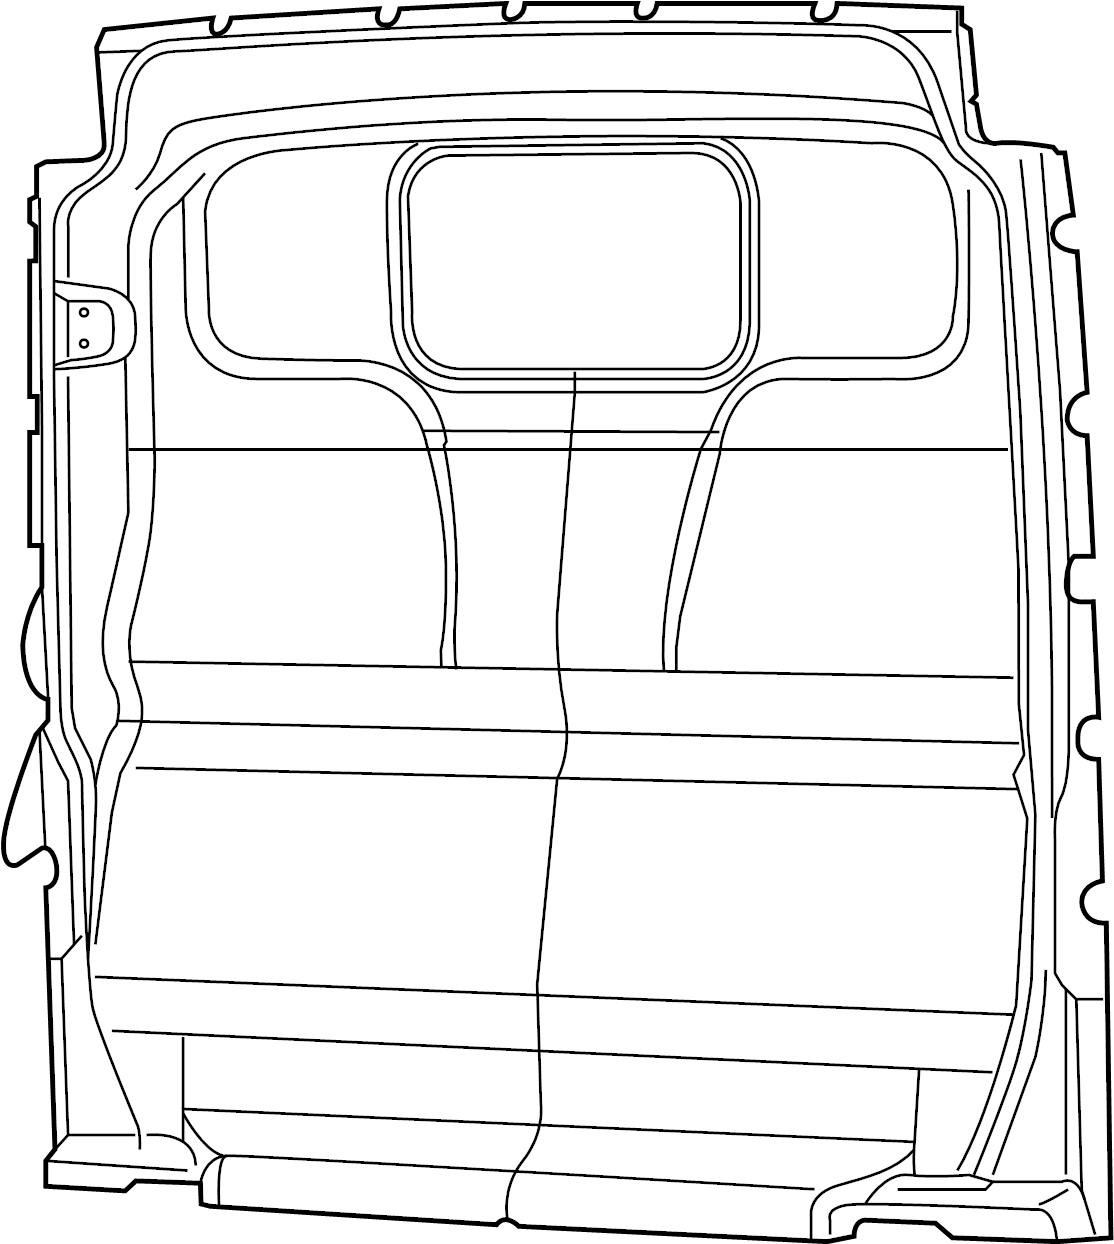 Ram Promaster Partition Panel W O Window Rocker